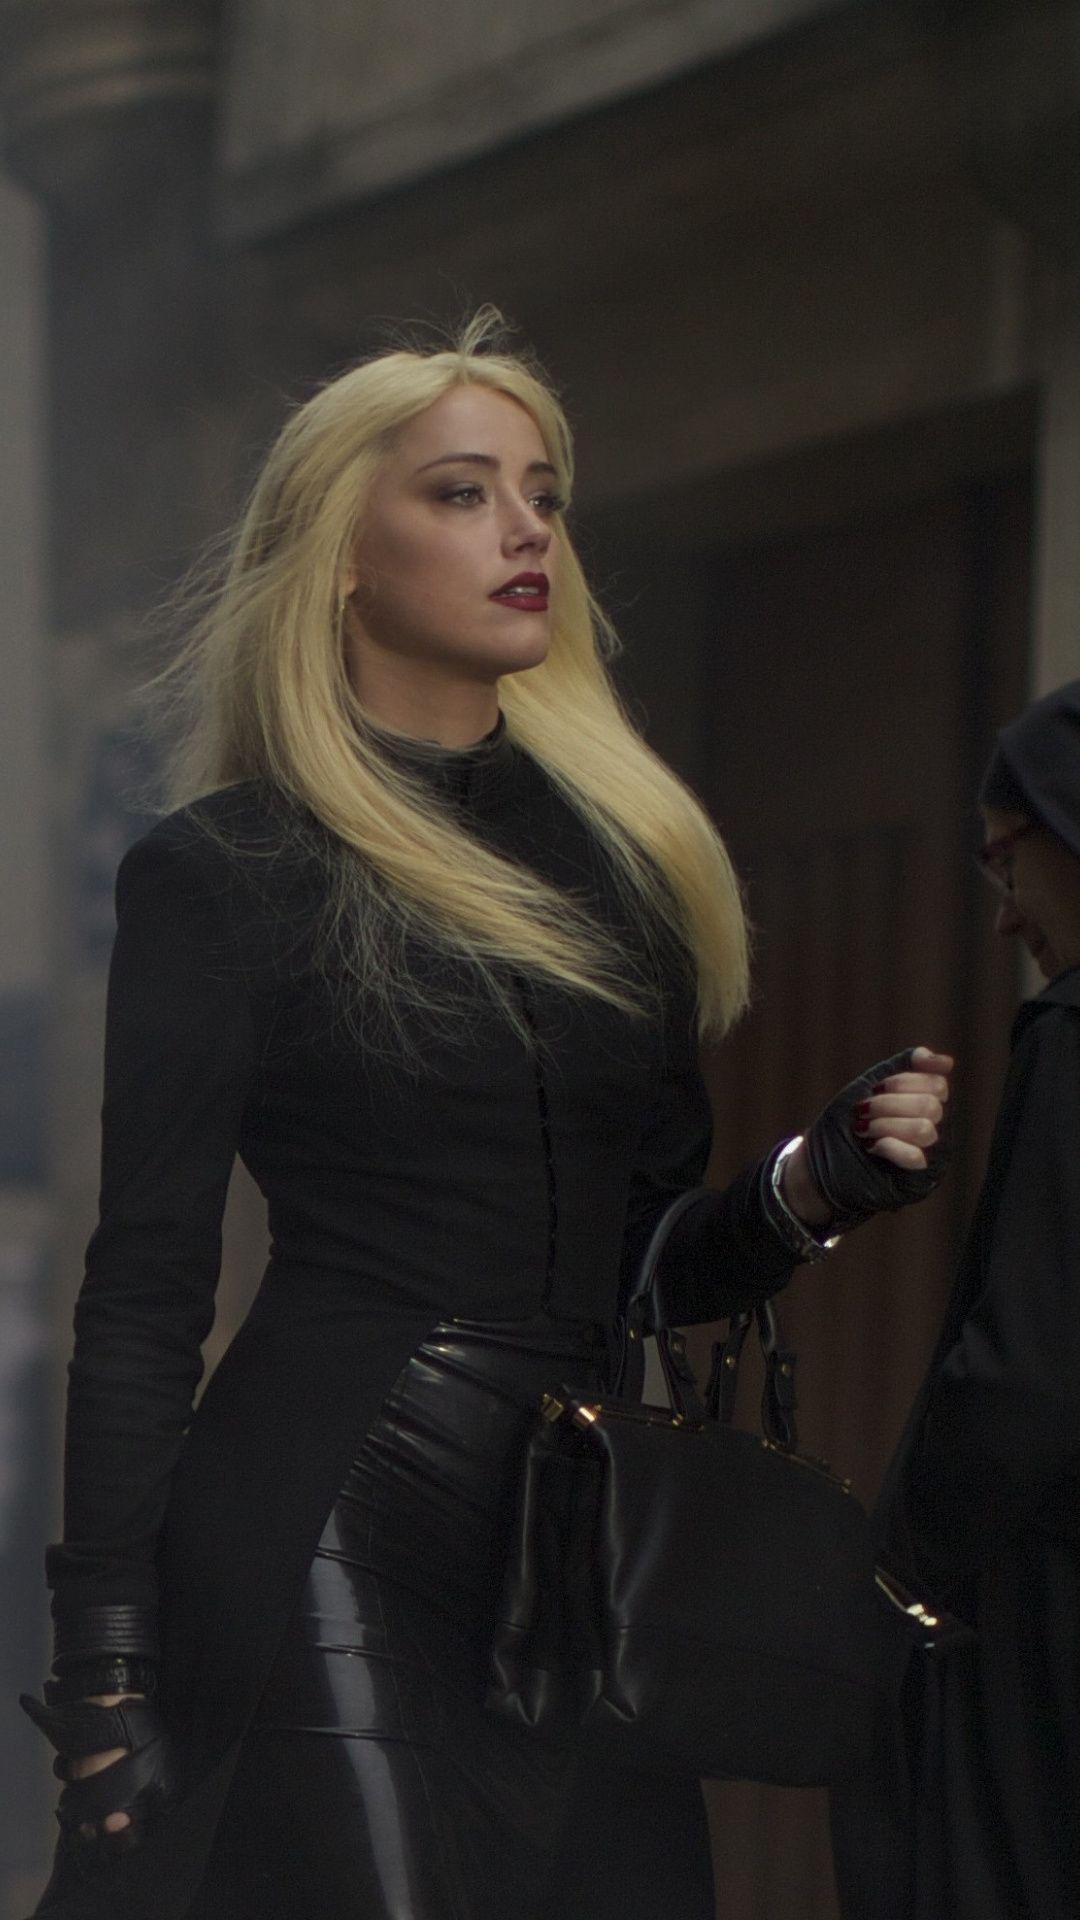 Amber Heard Movie 3 Days To Kill 1080x1920 Wallpaper Amber Heard Movies Amber Heard Amber Heard Hot